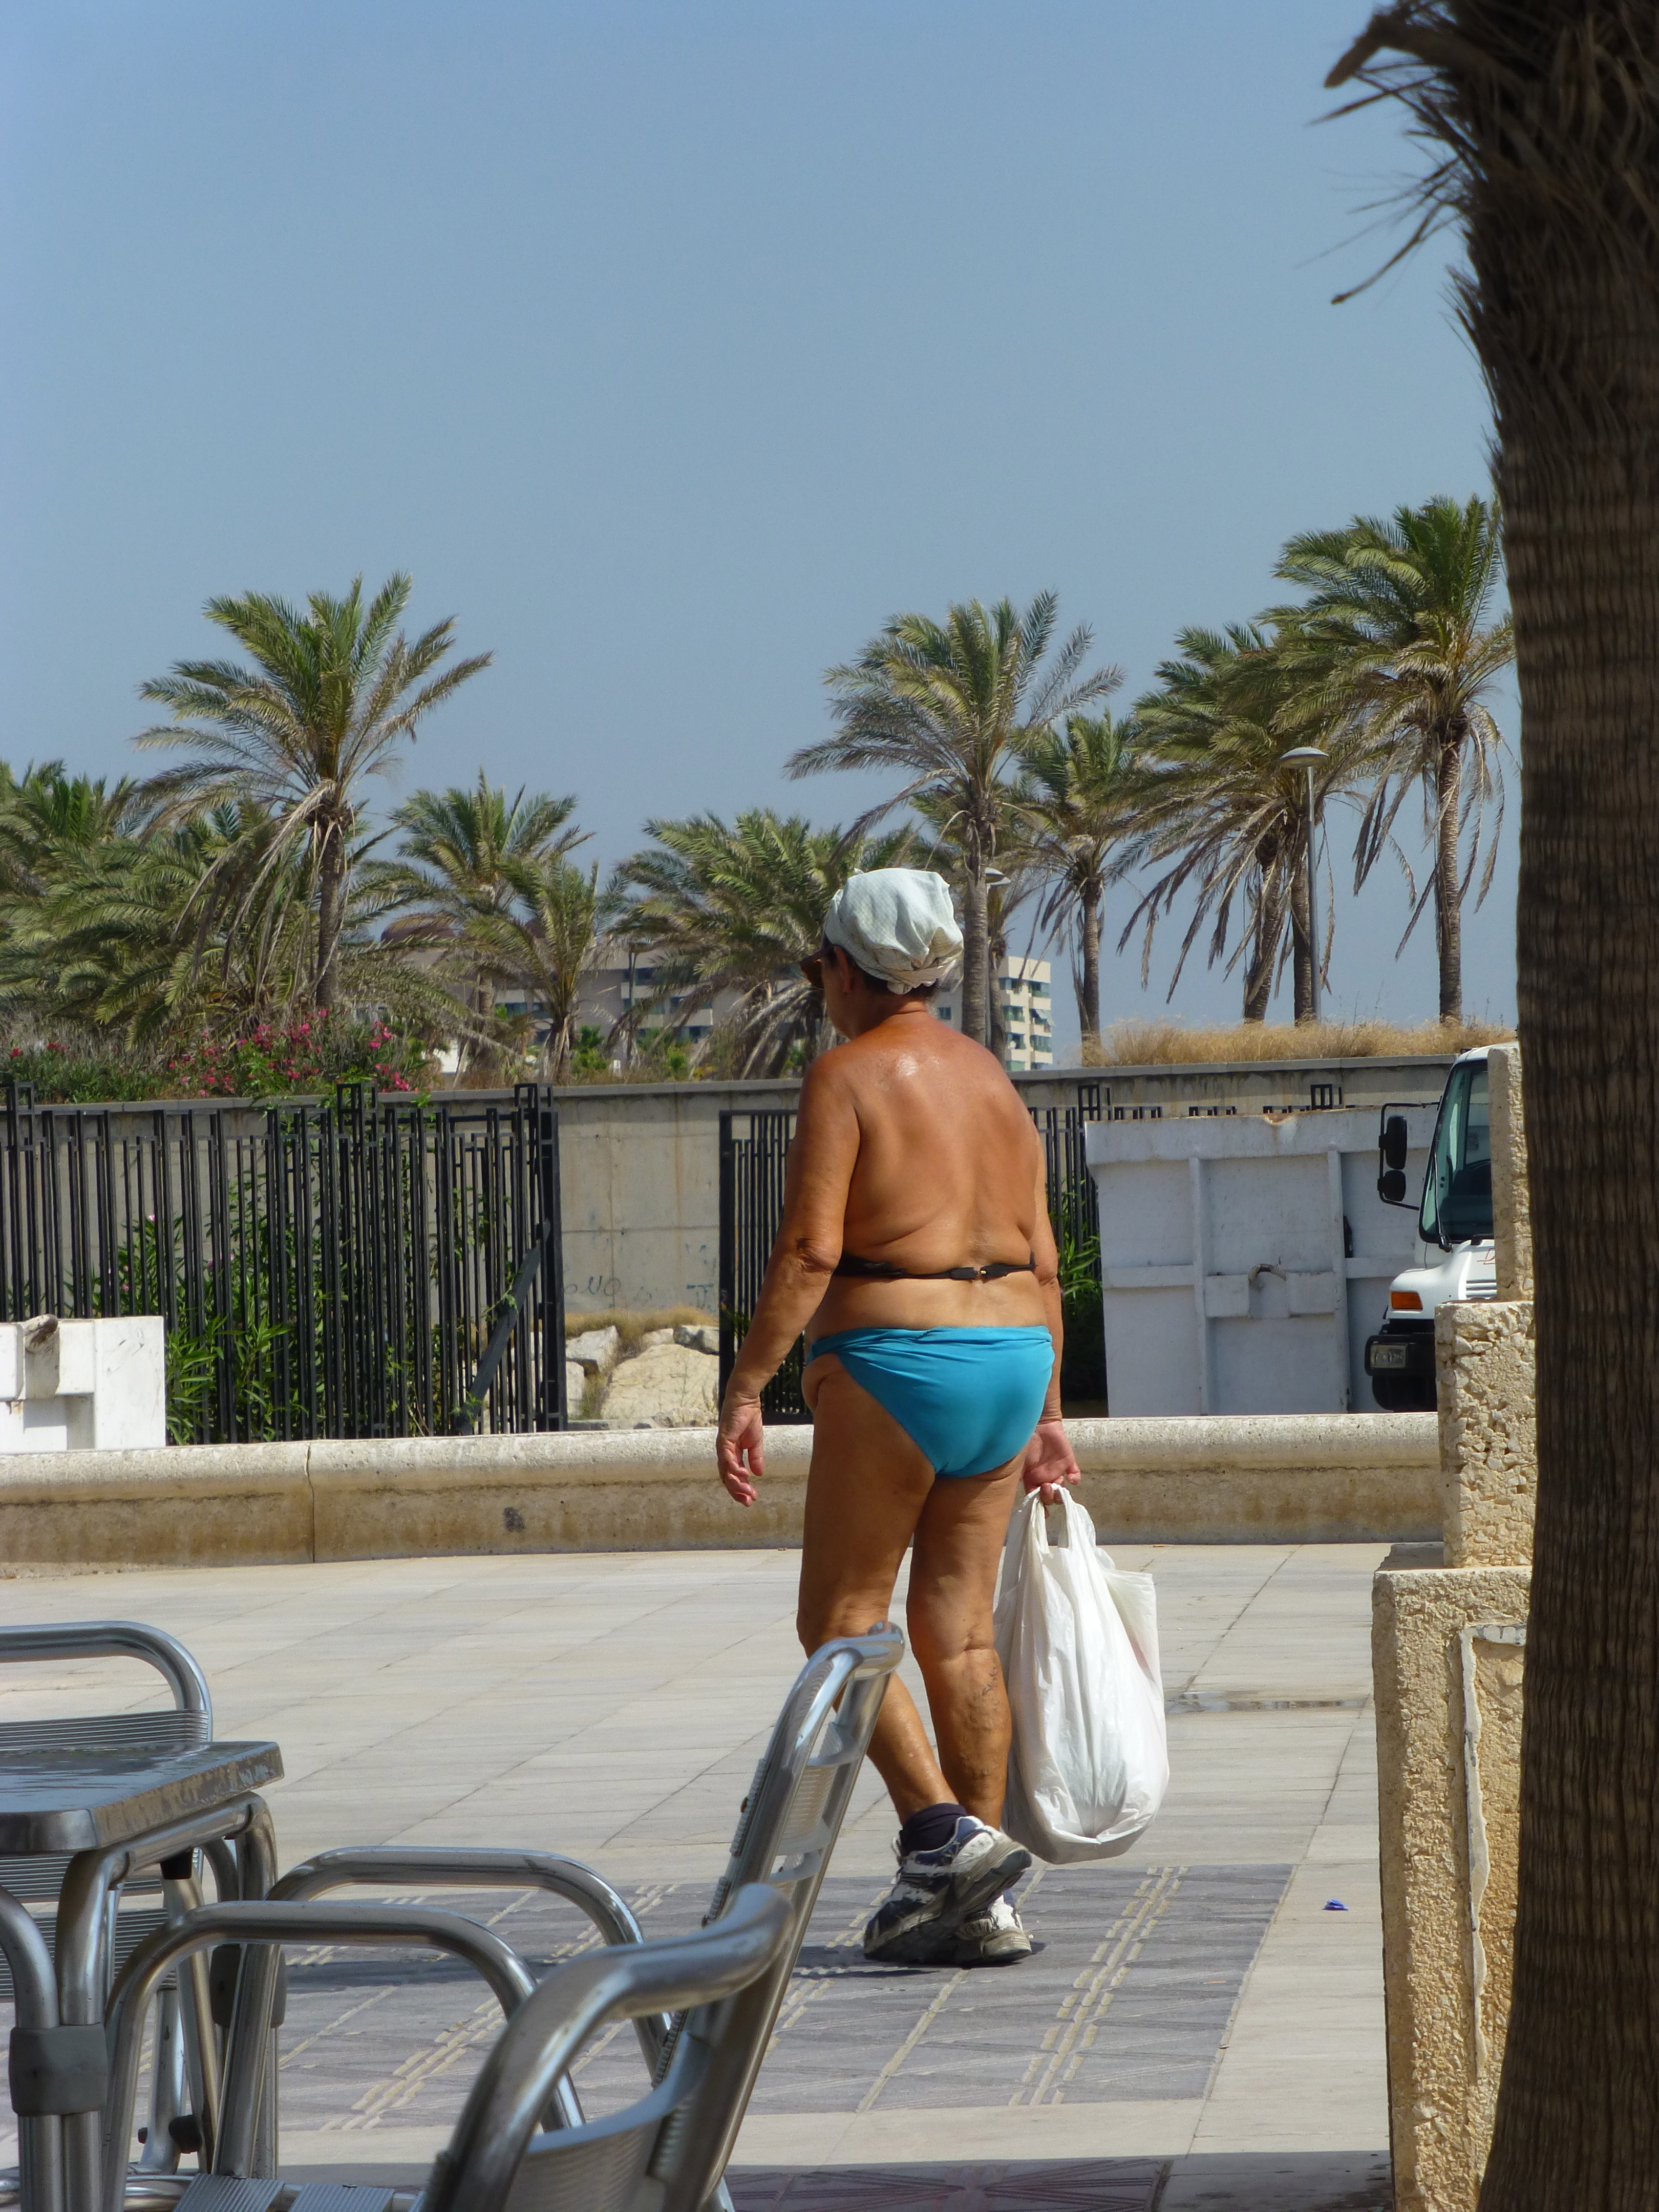 Older woman in topless bathing suit